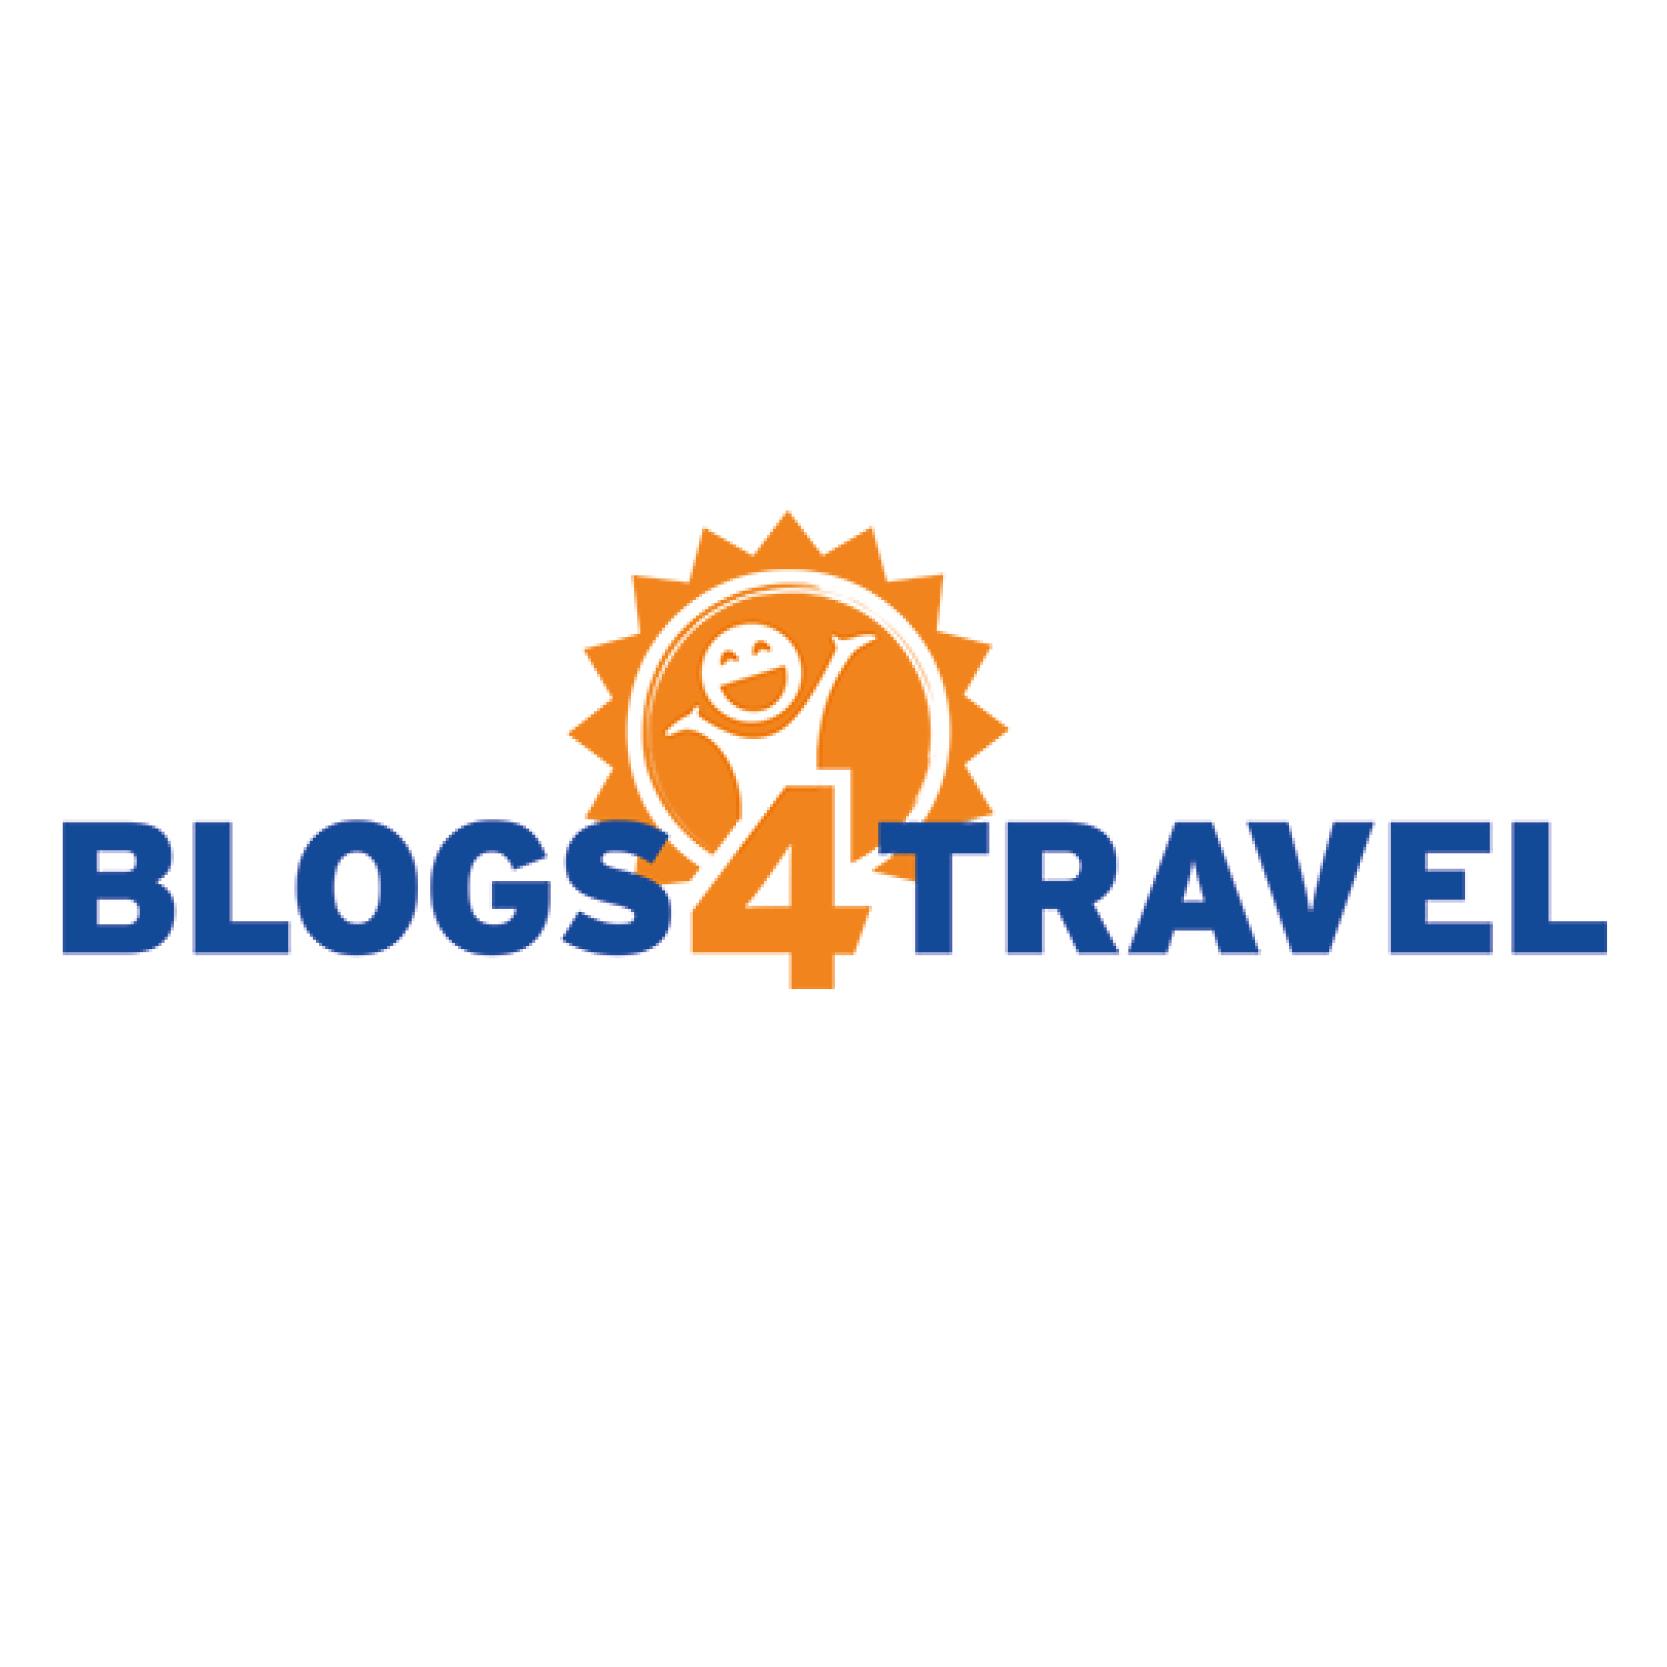 Blogs4Travel